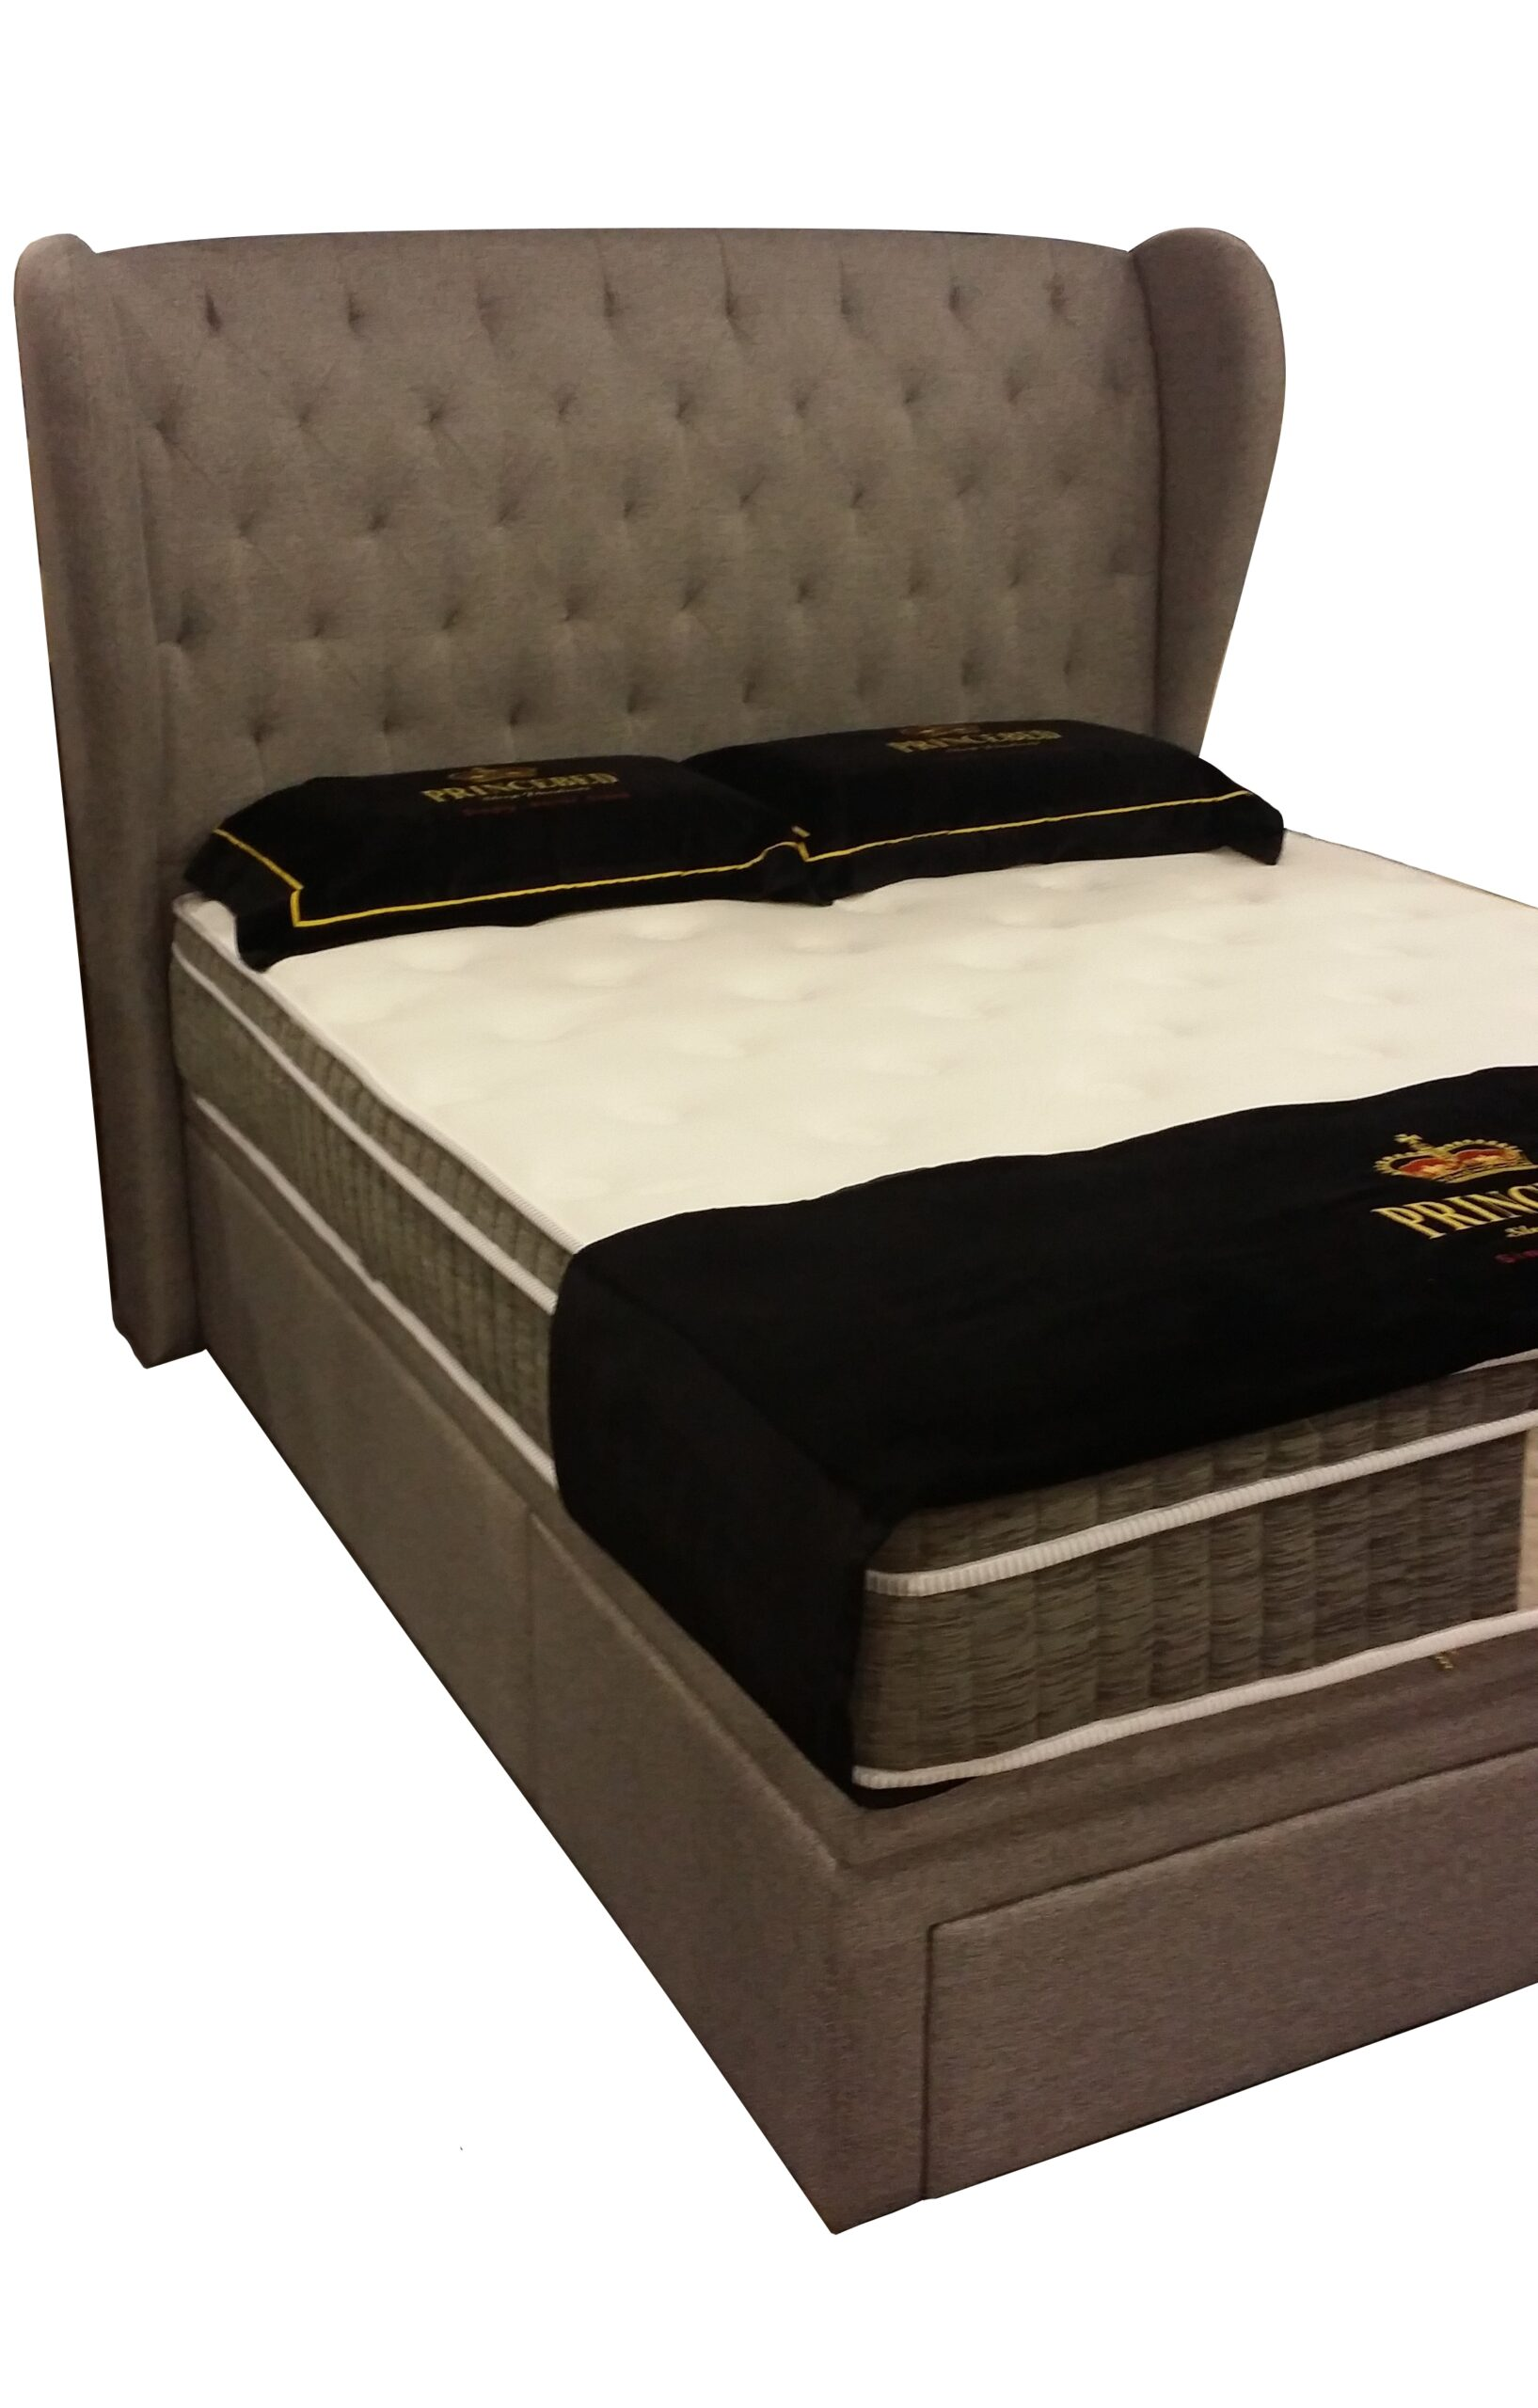 Windy Storage Bed Frame